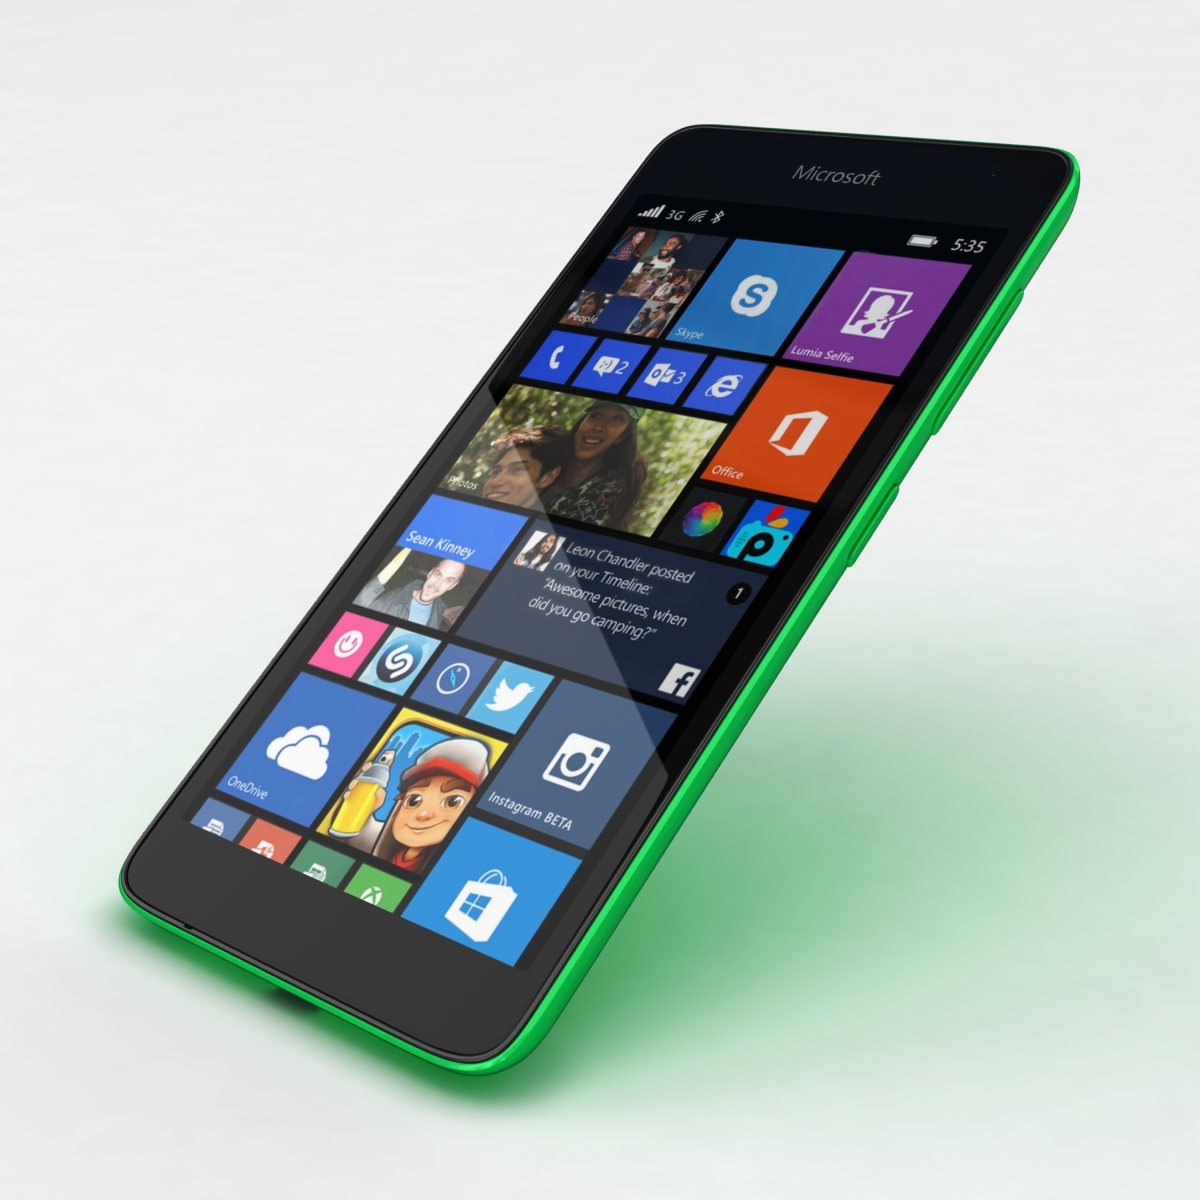 microsoft lumia 535 and dual sim green 3d model 3ds max fbx c4d obj 204182